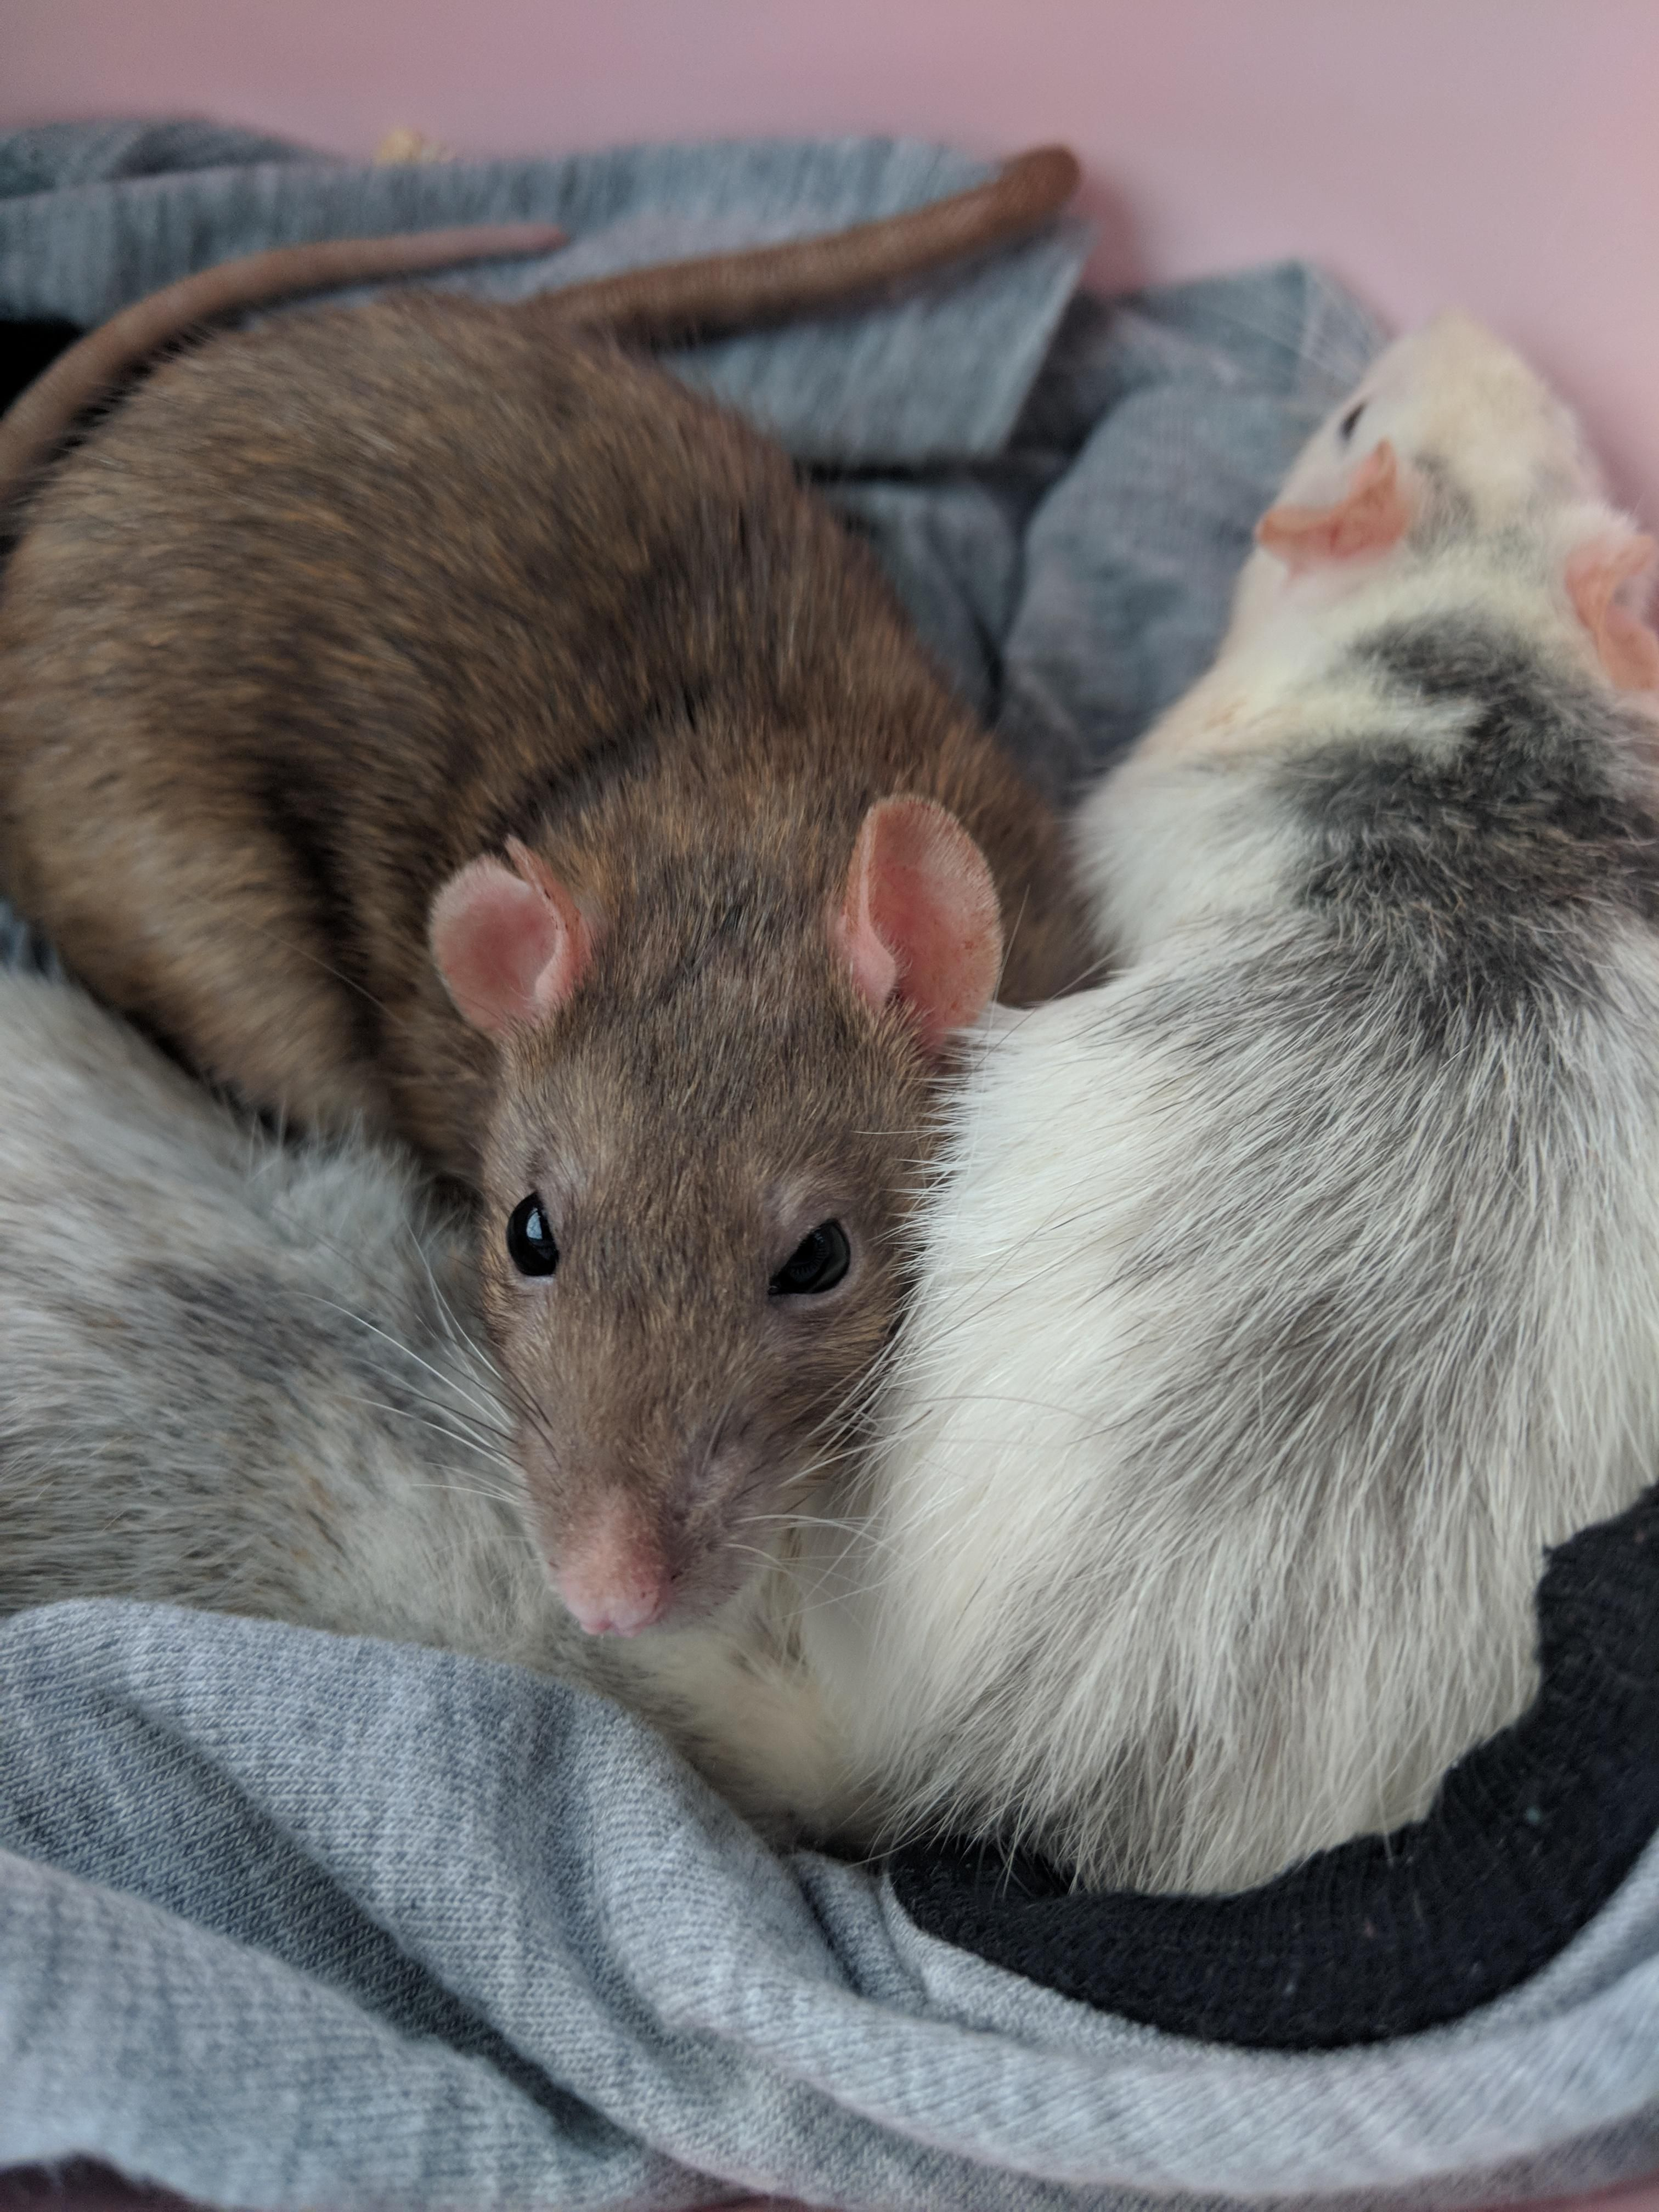 New Additions To The Family Aww Cute Rat Cuterats Ratsofpinterest Cuddle Fluffy Animals Pets Bestfriend Ittssofluff Pet Rodents Cute Rats Small Pets